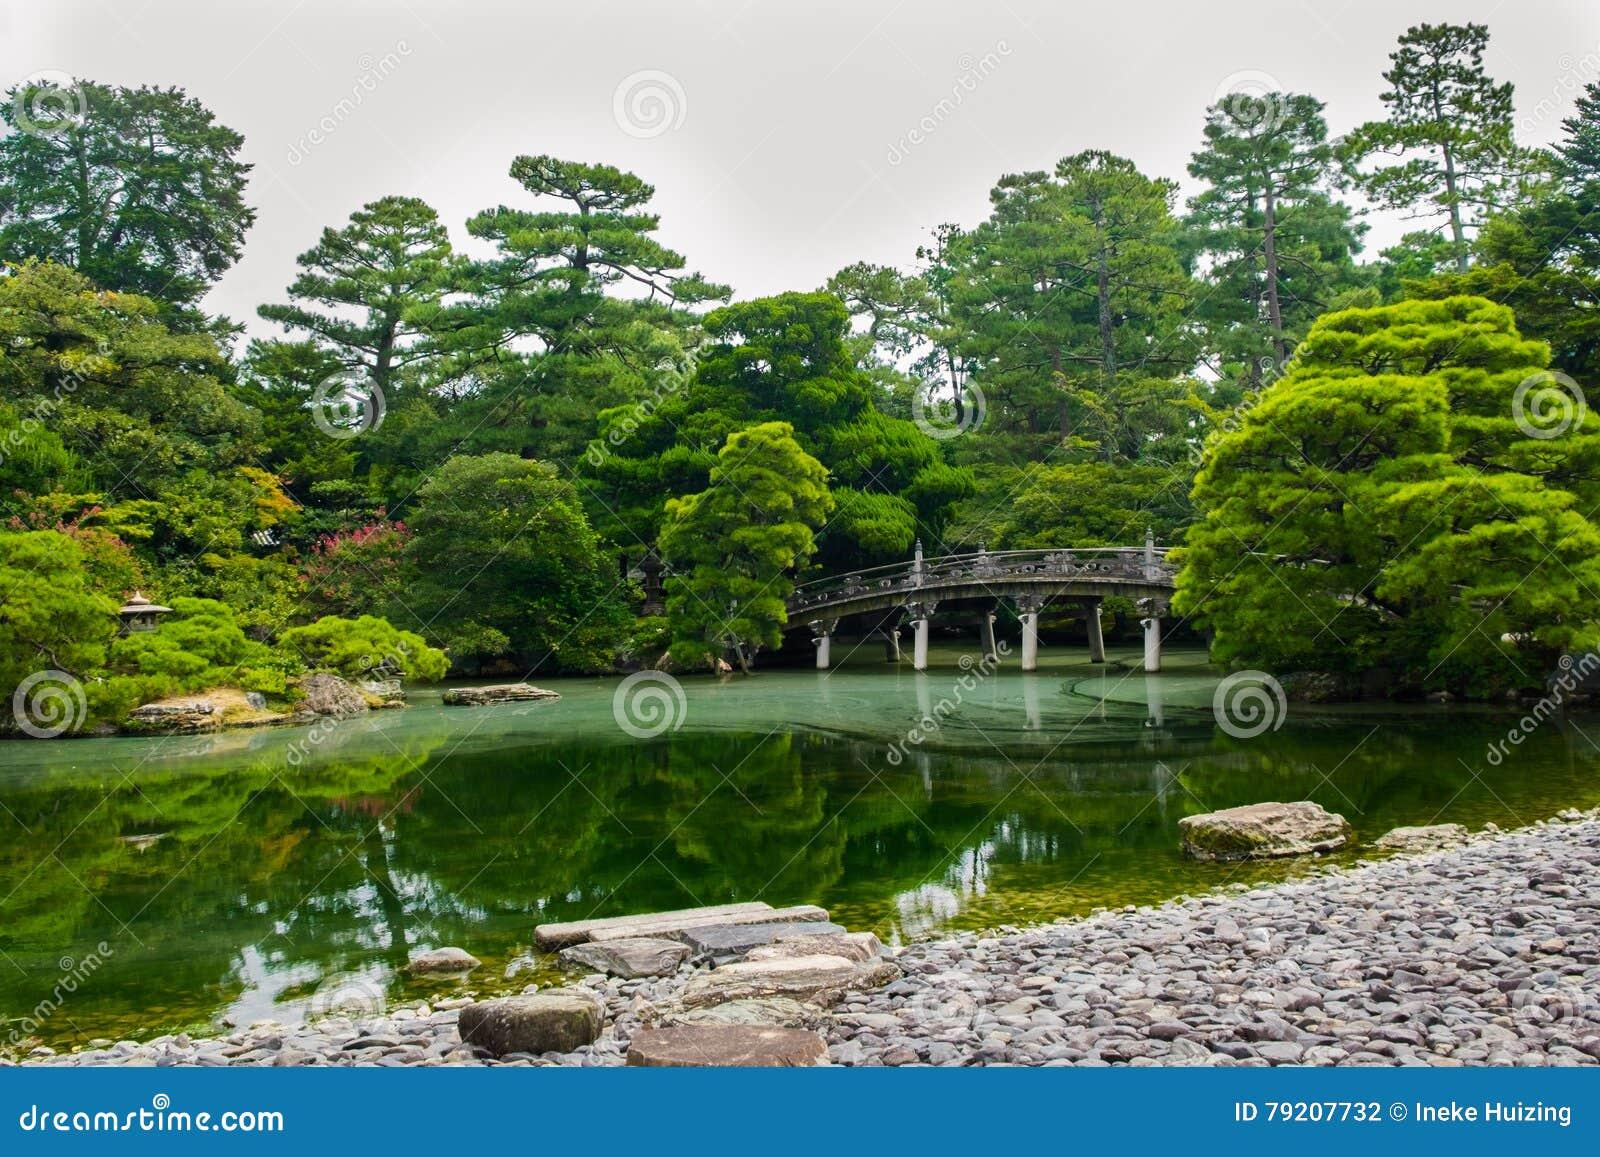 jardines japoneses kyoto japn foto de archivo